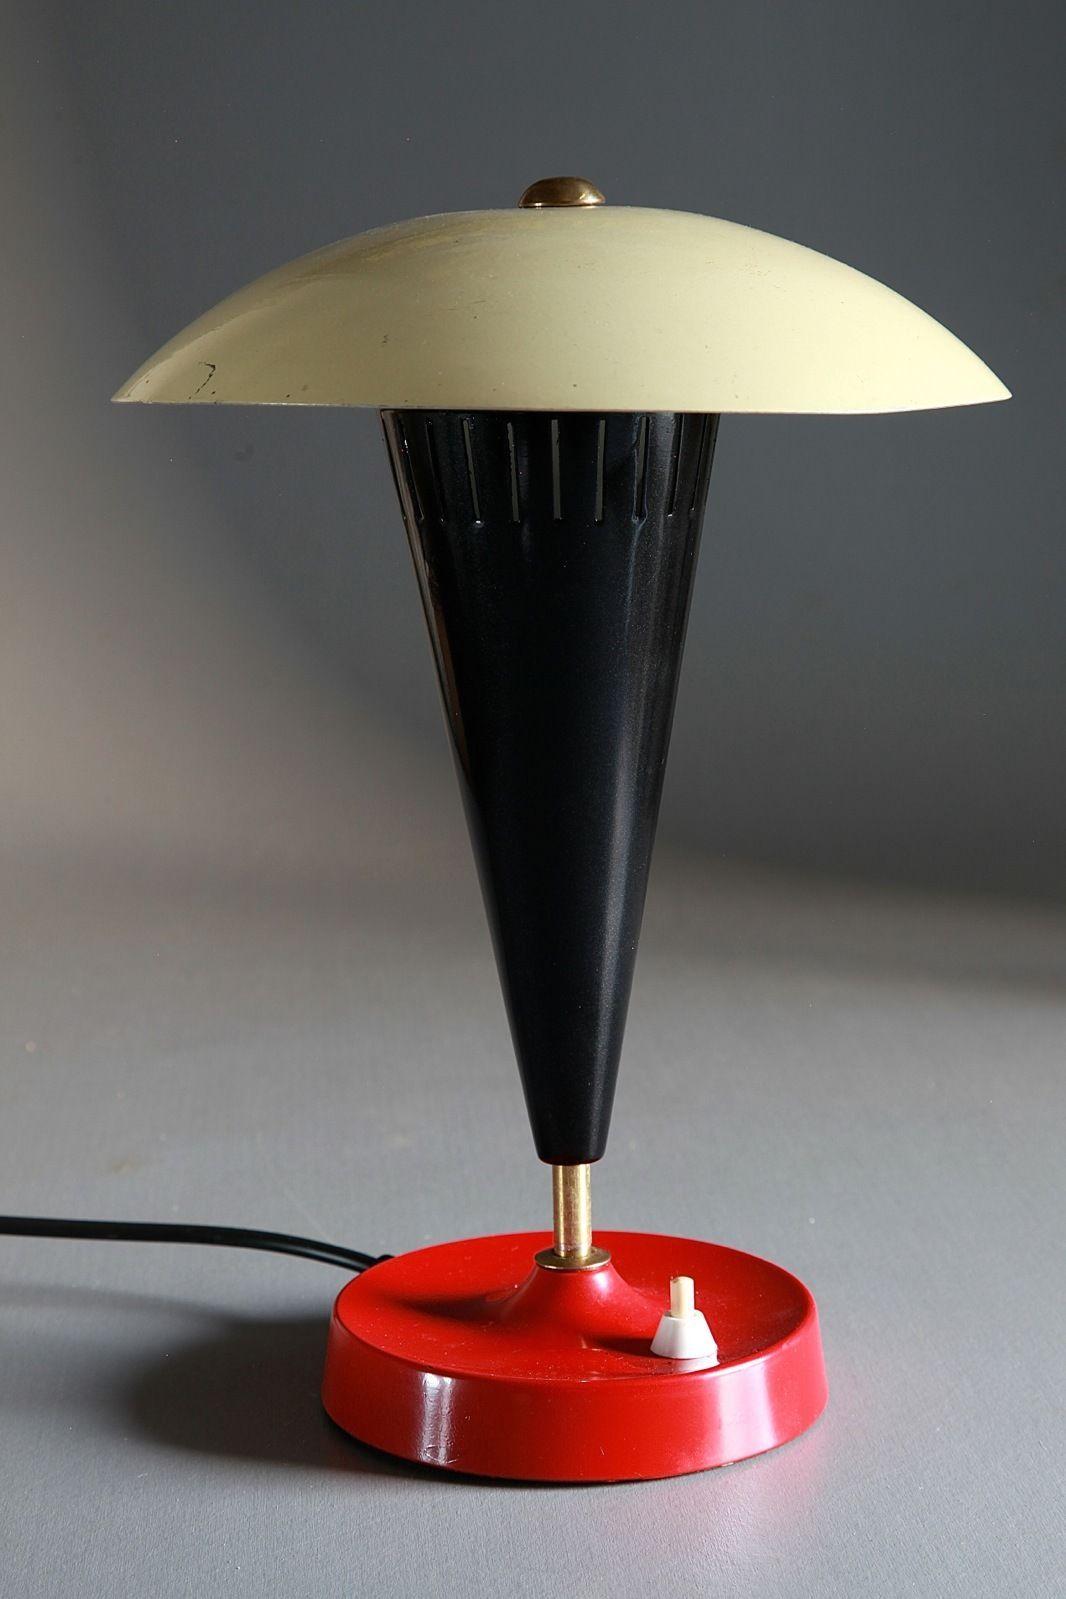 1950 Stilnovo Italy 1950 Lampes Vintage Lampe Retro Lampe Art Deco